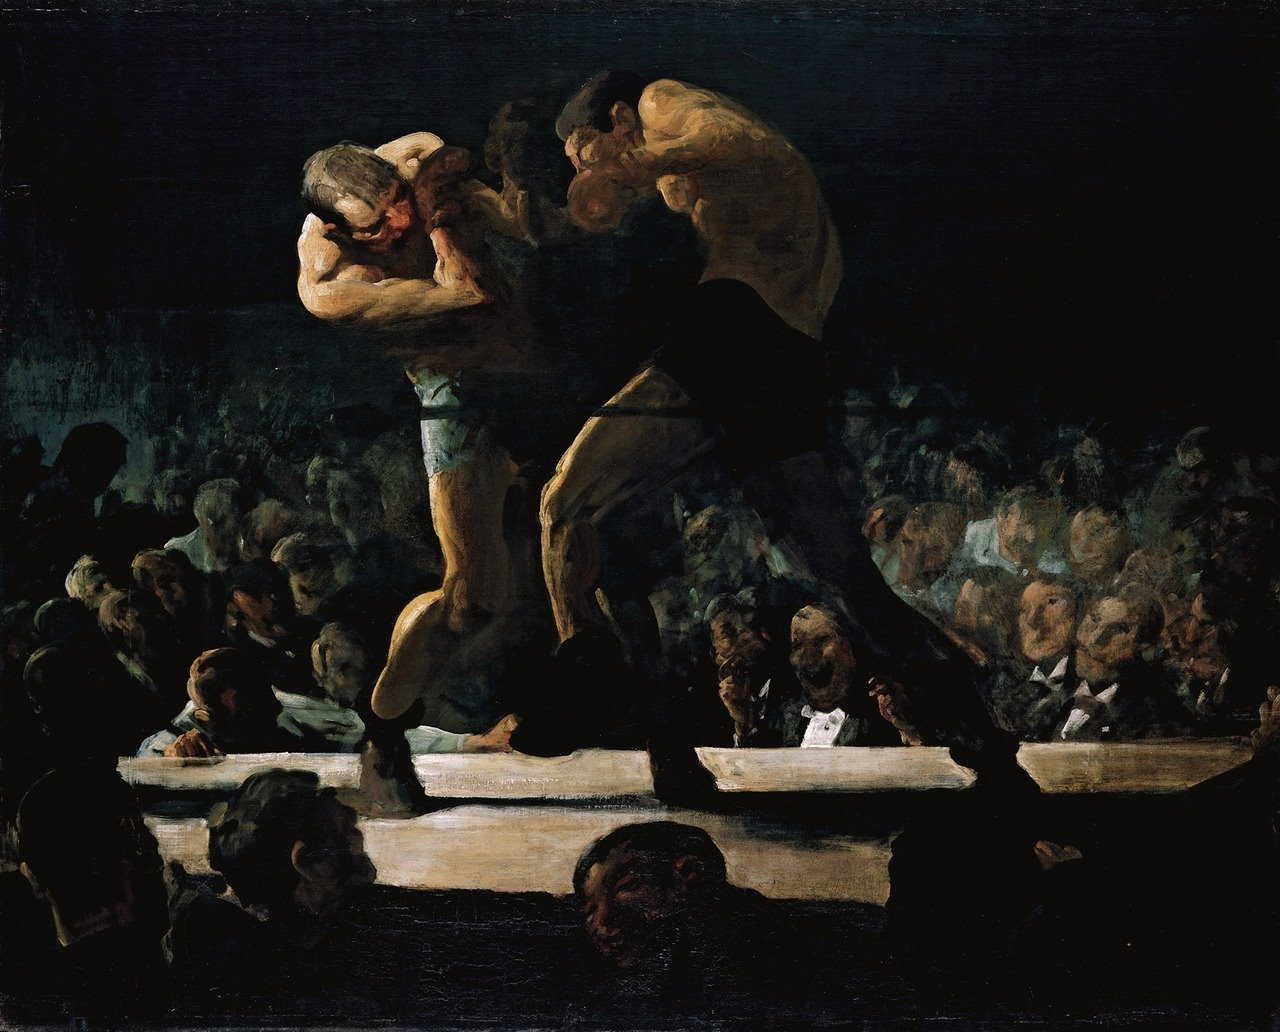 Club night de Georges Bellowz 1907